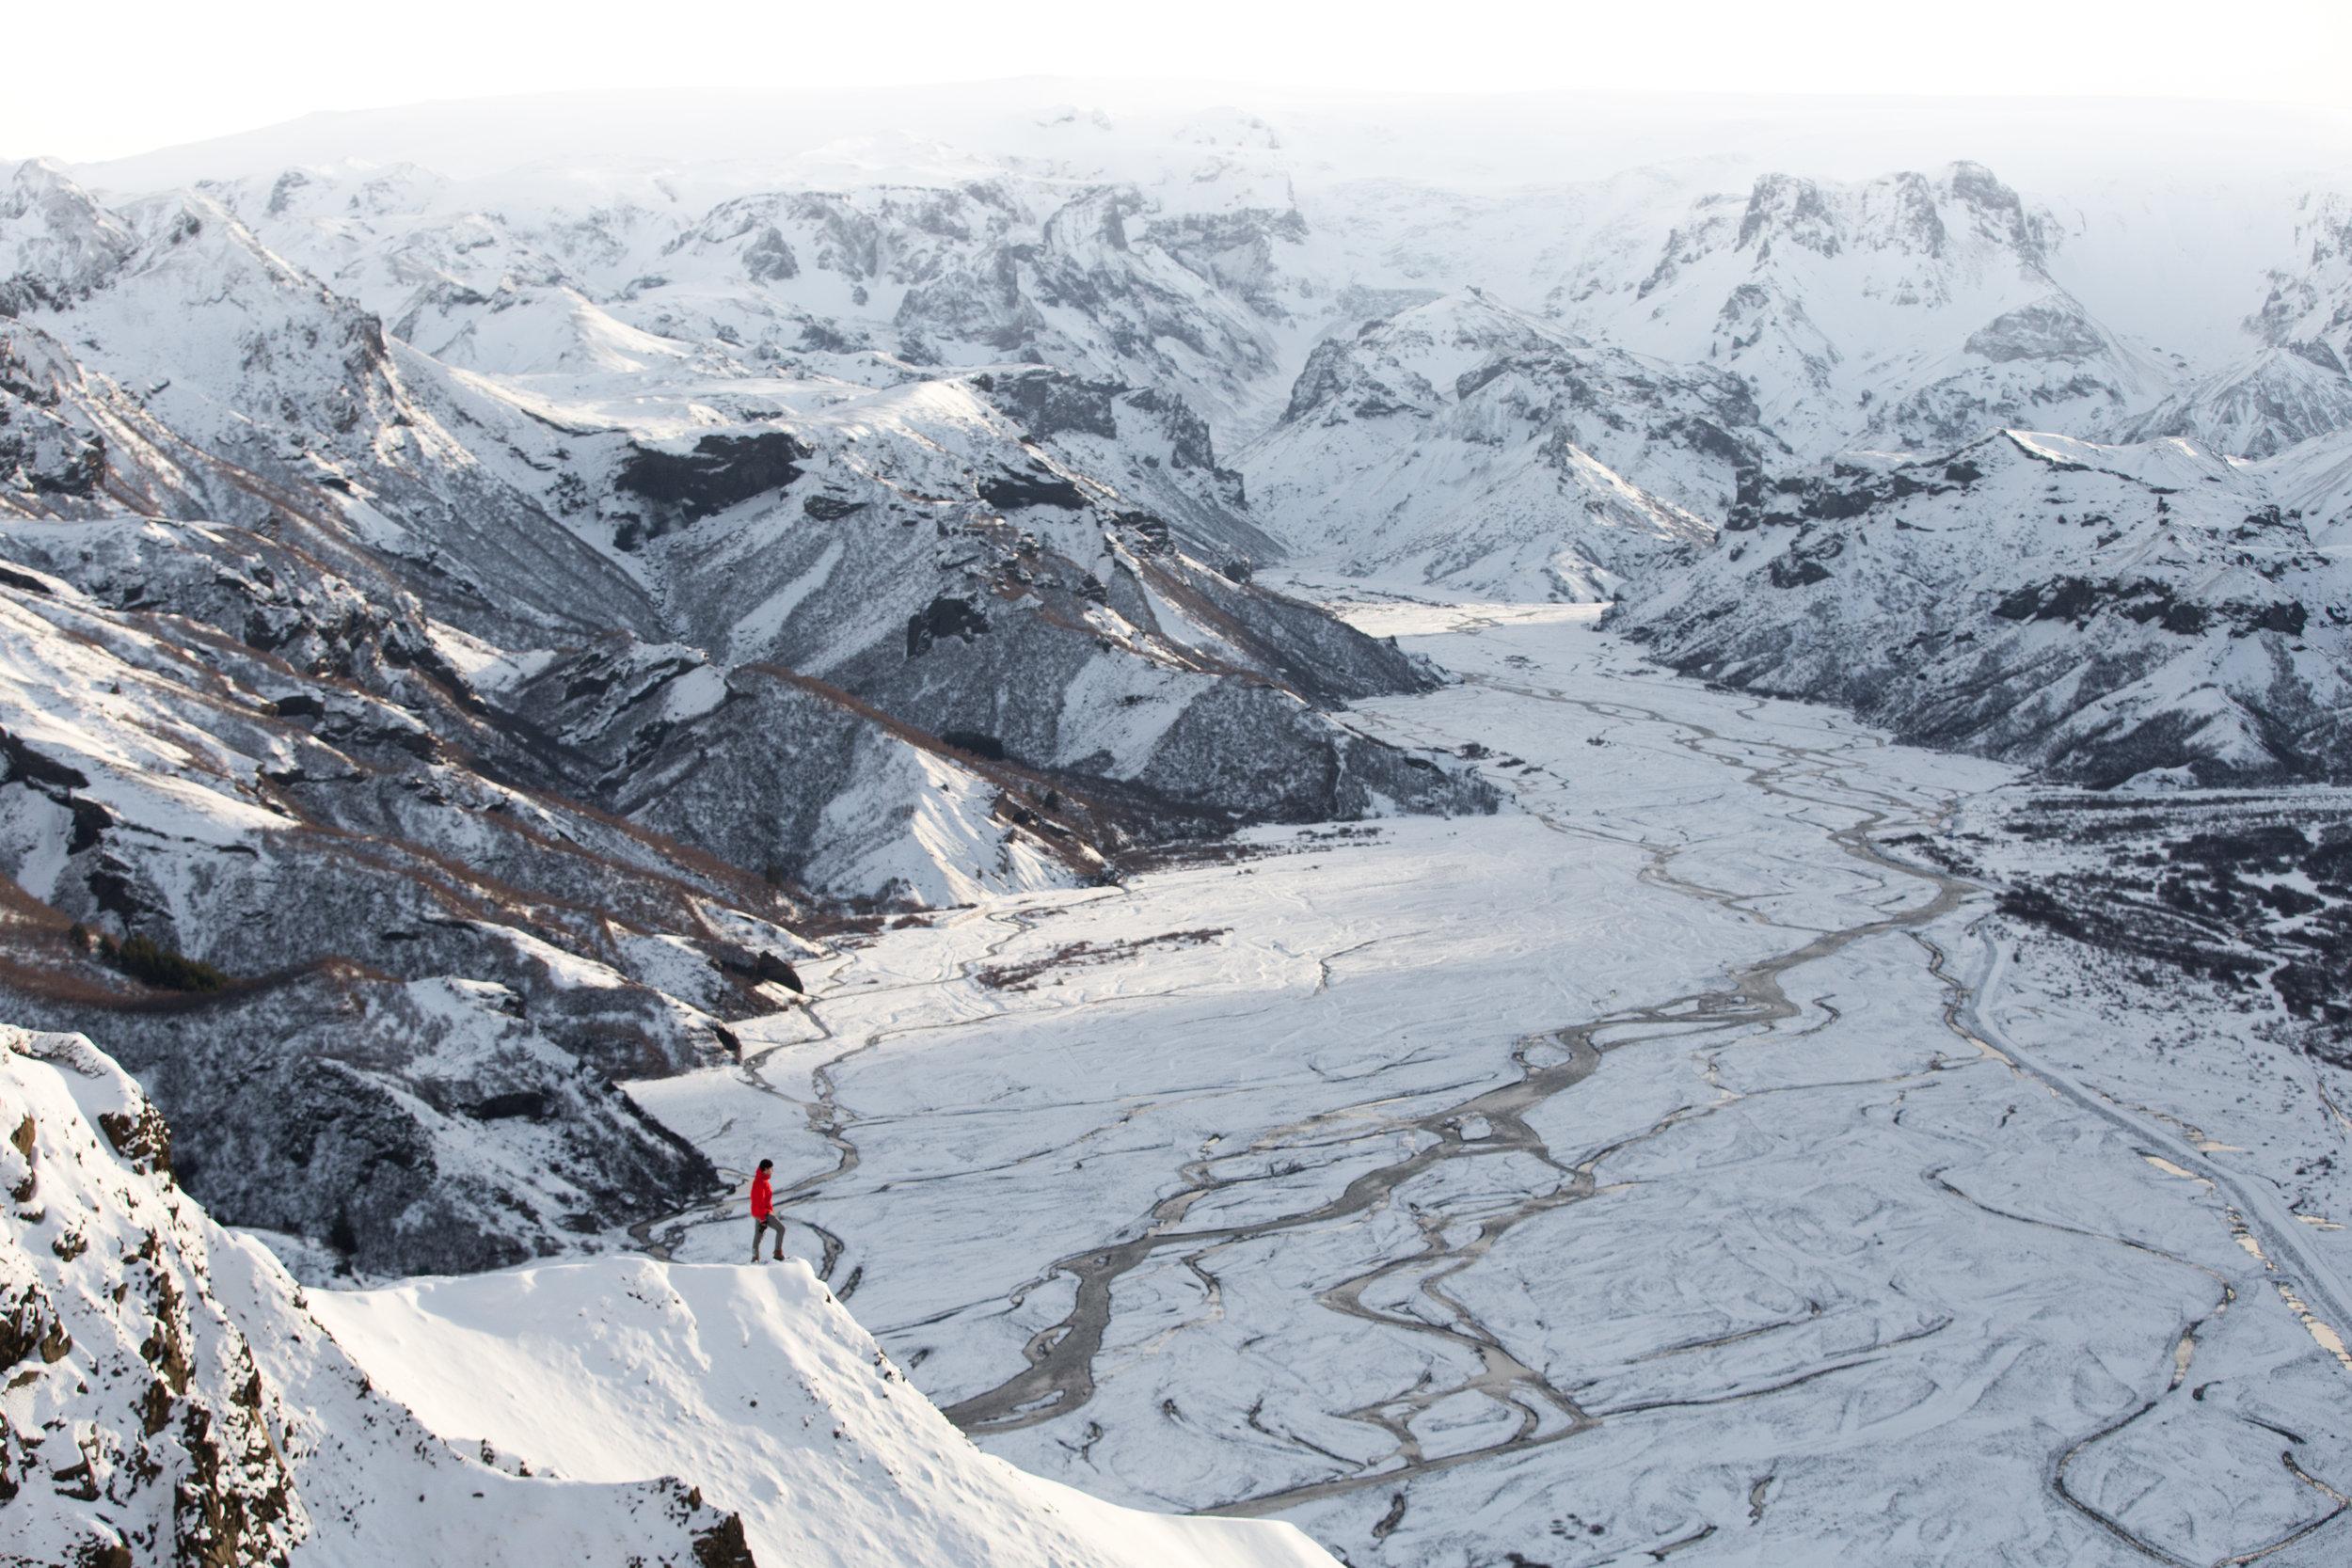 jermiah-schuster-iceland-232.jpg